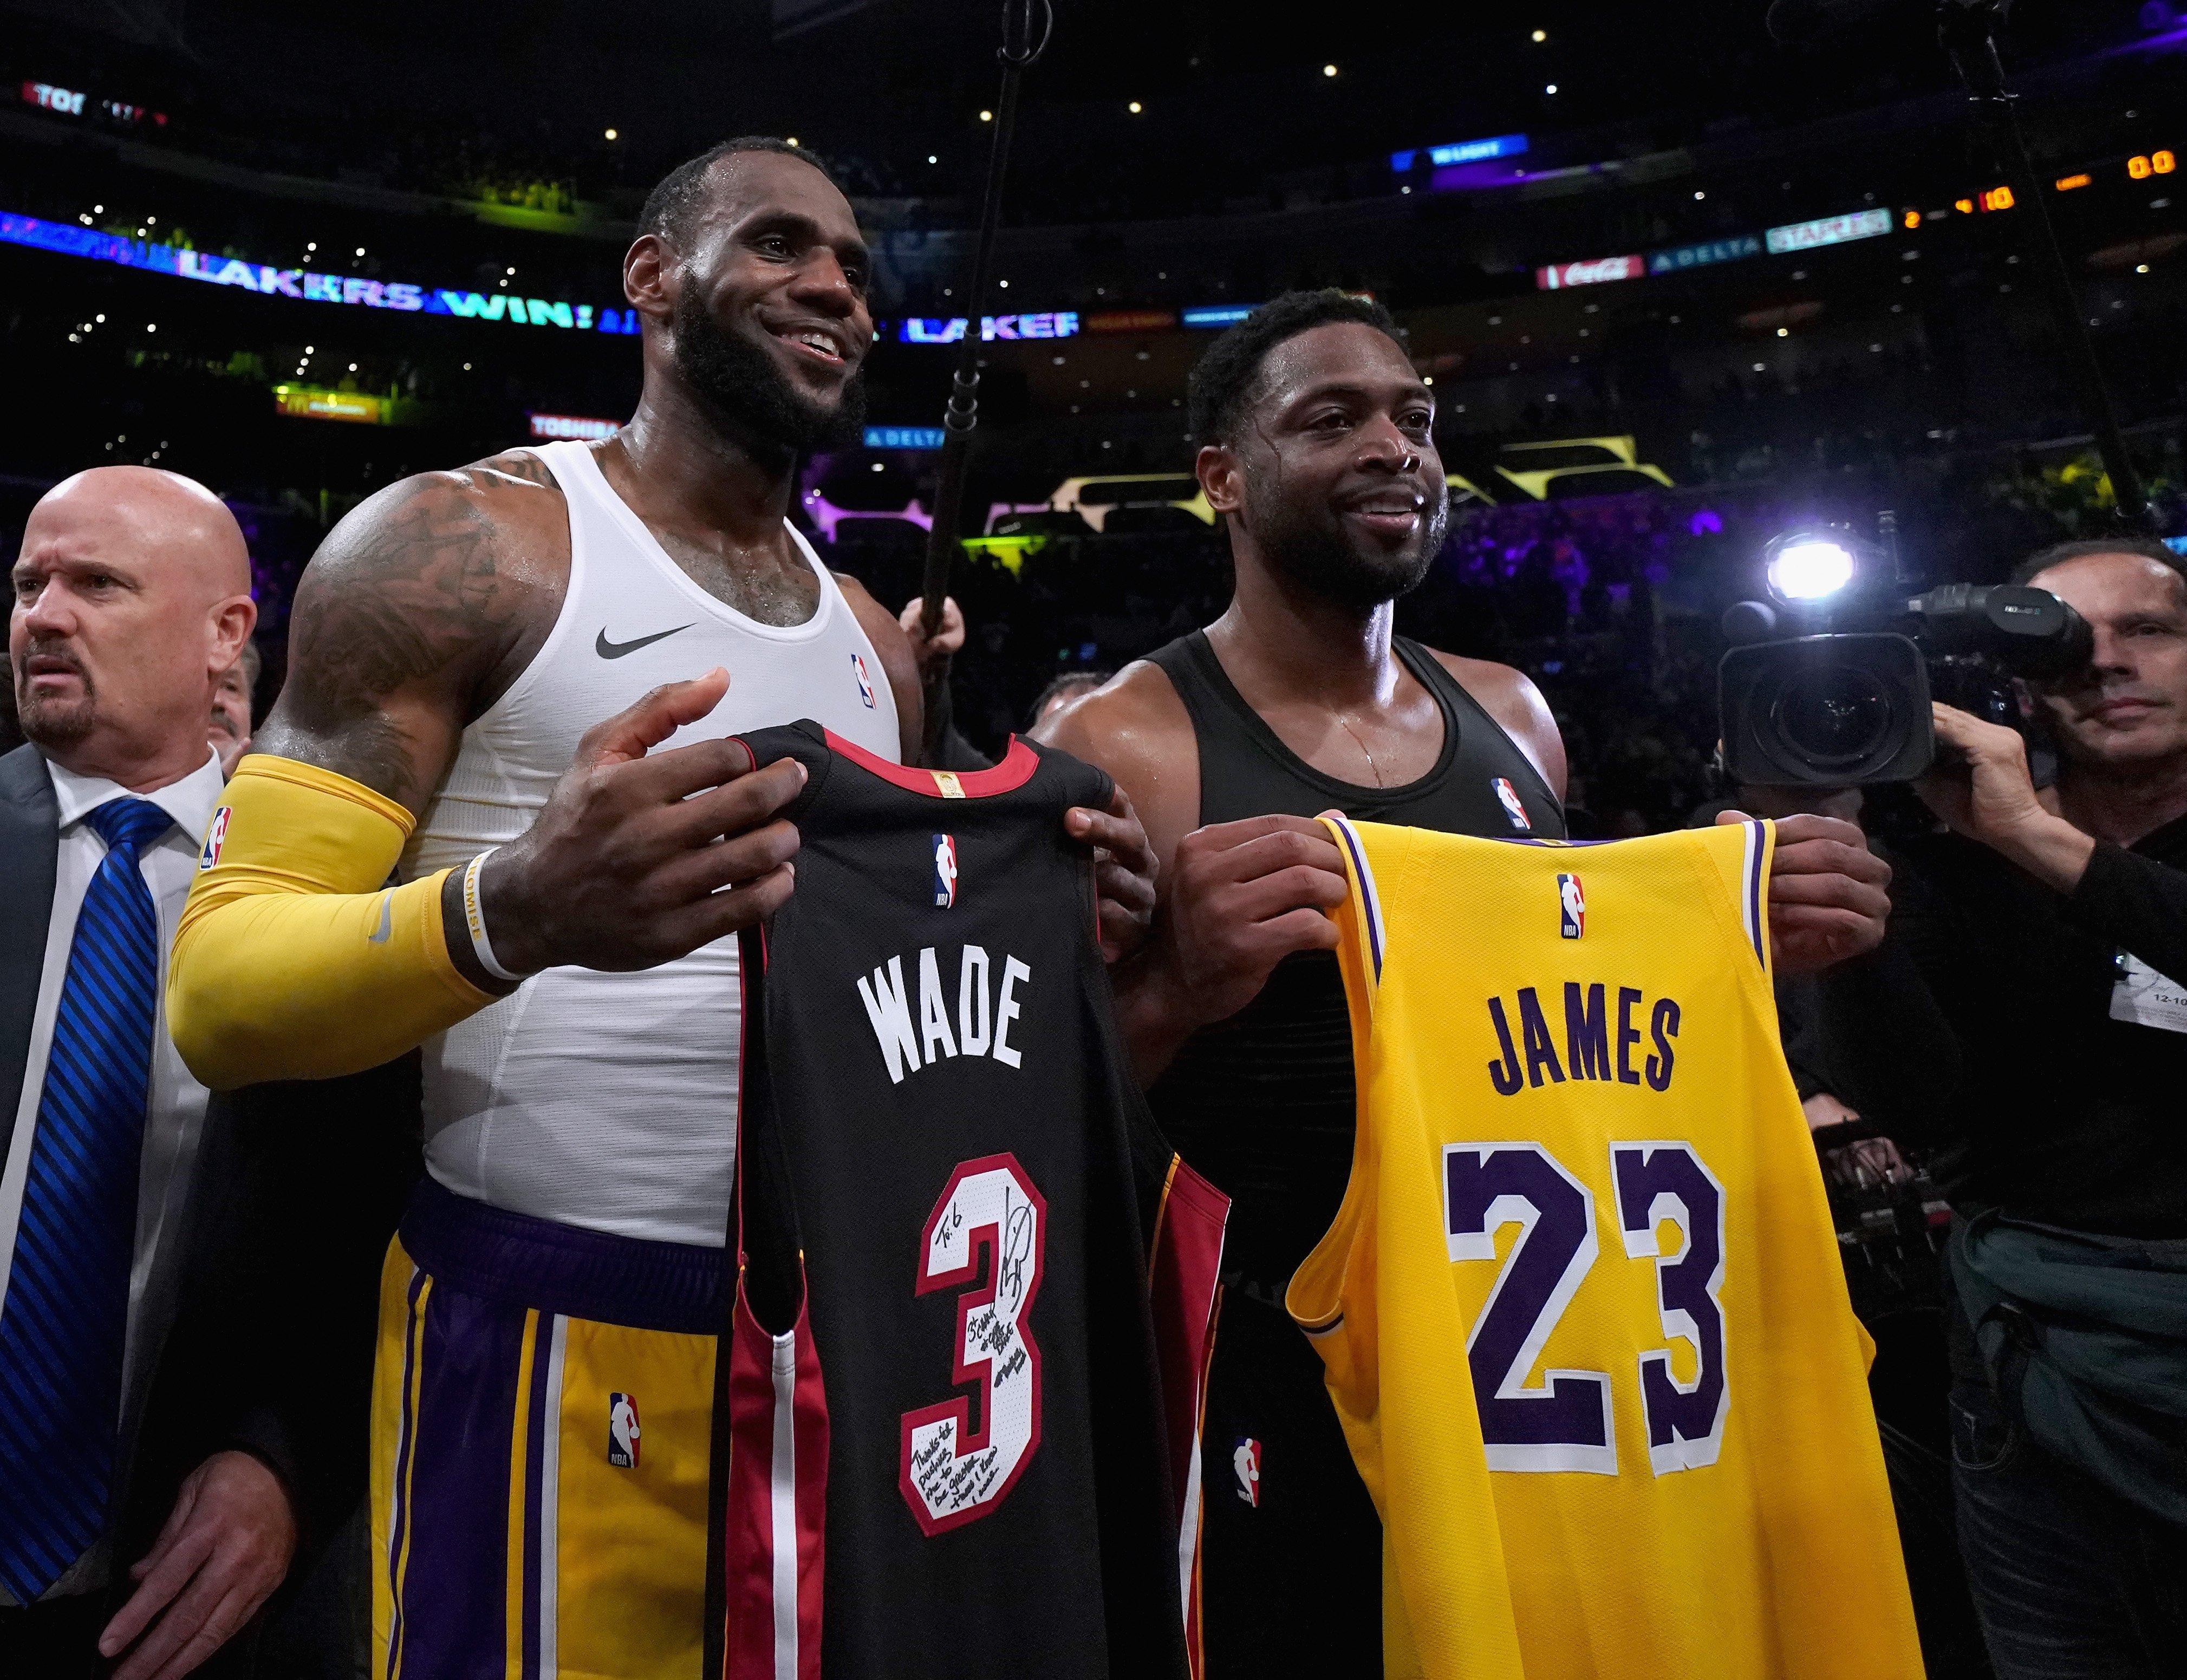 LeBron's Lakers edge Wade's Heat in superstars' final showdown